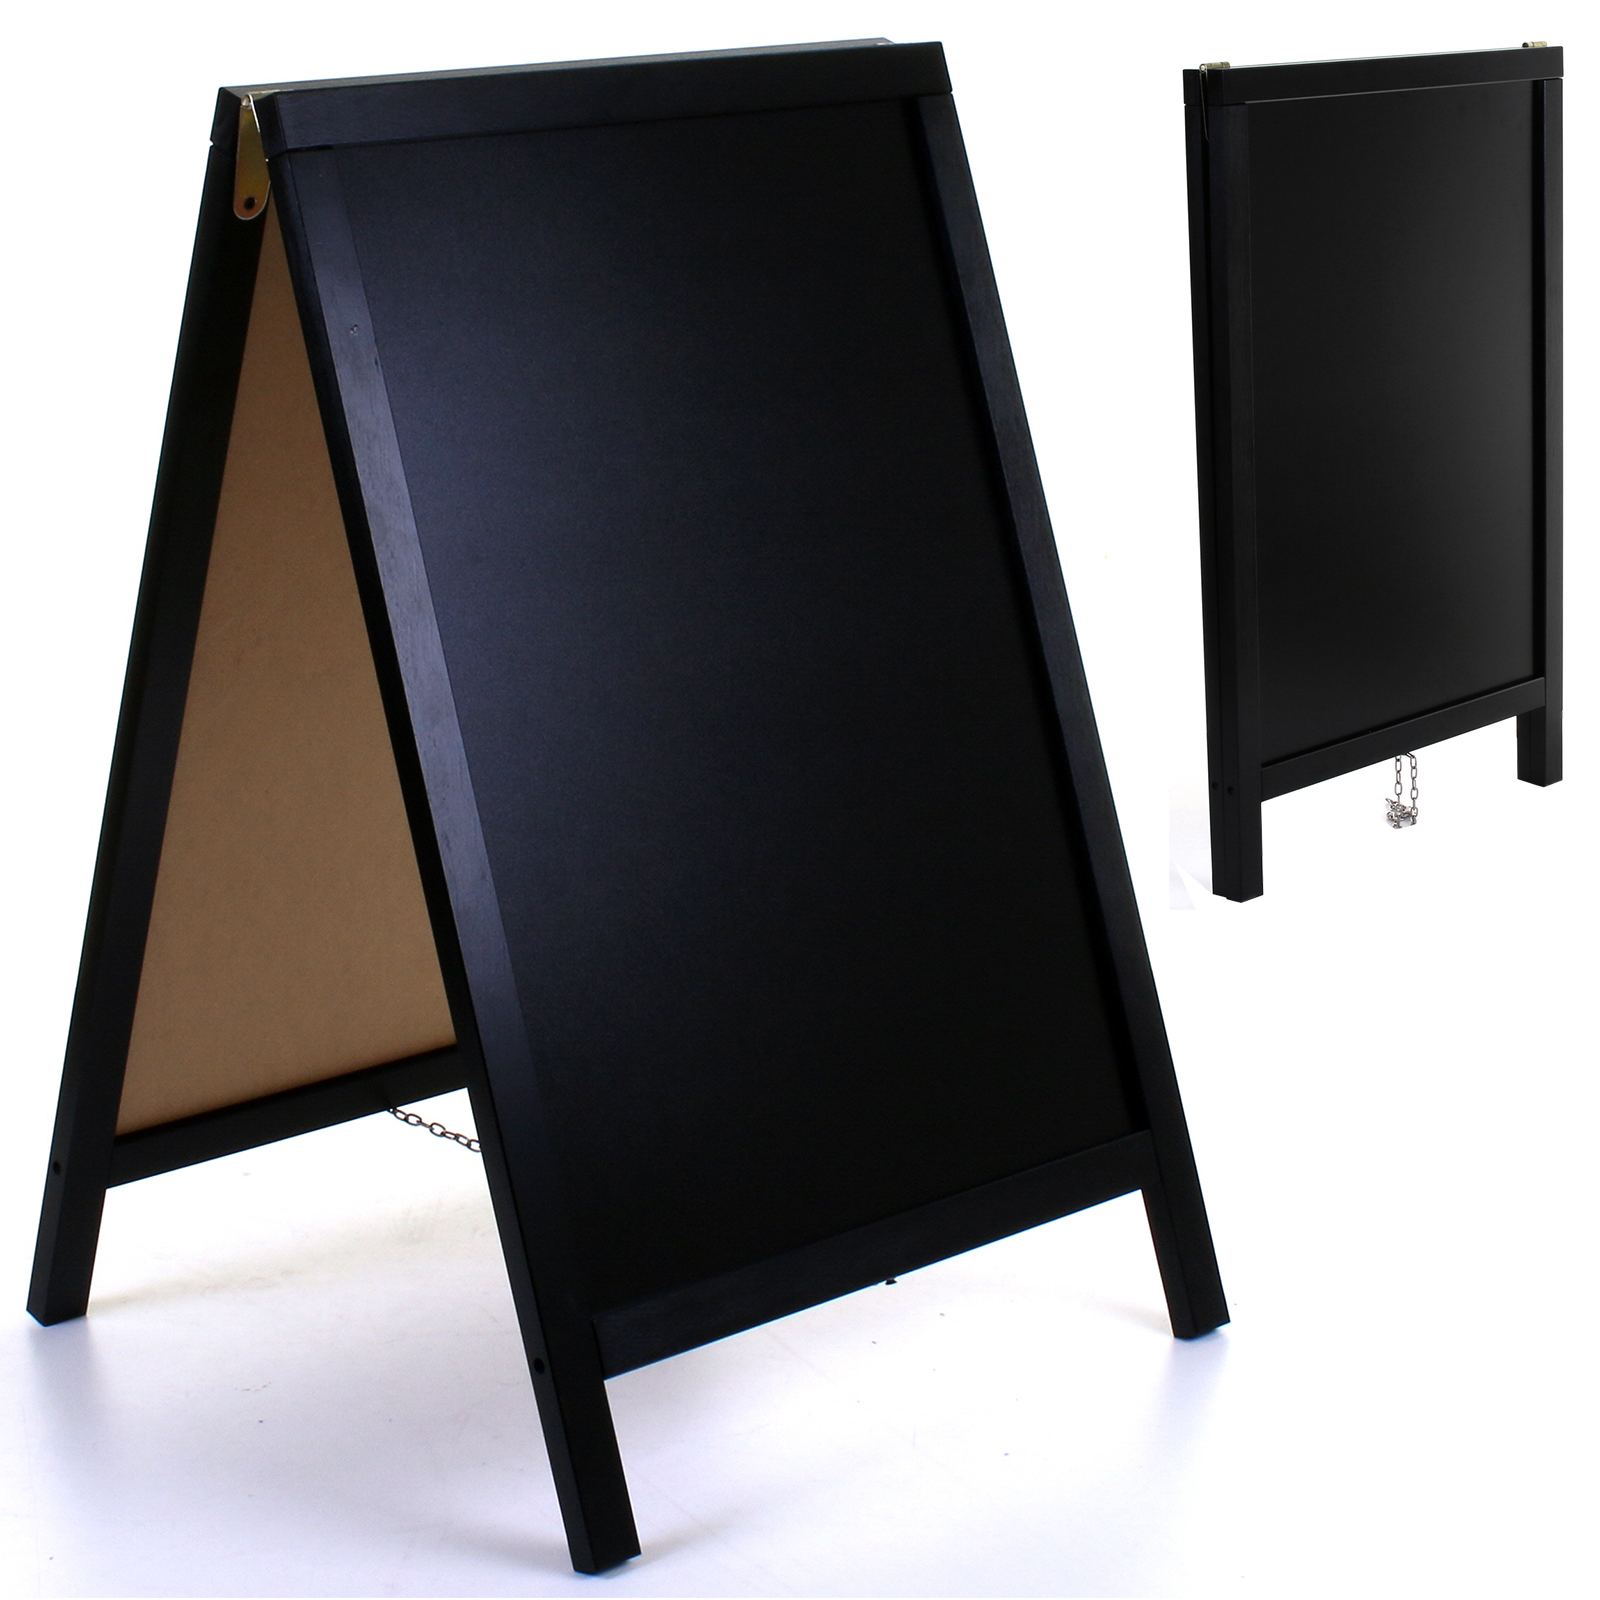 Wooden Chalk Board Blackboard Sign A-Board Pavement Pub Shop Cafe Display Stand